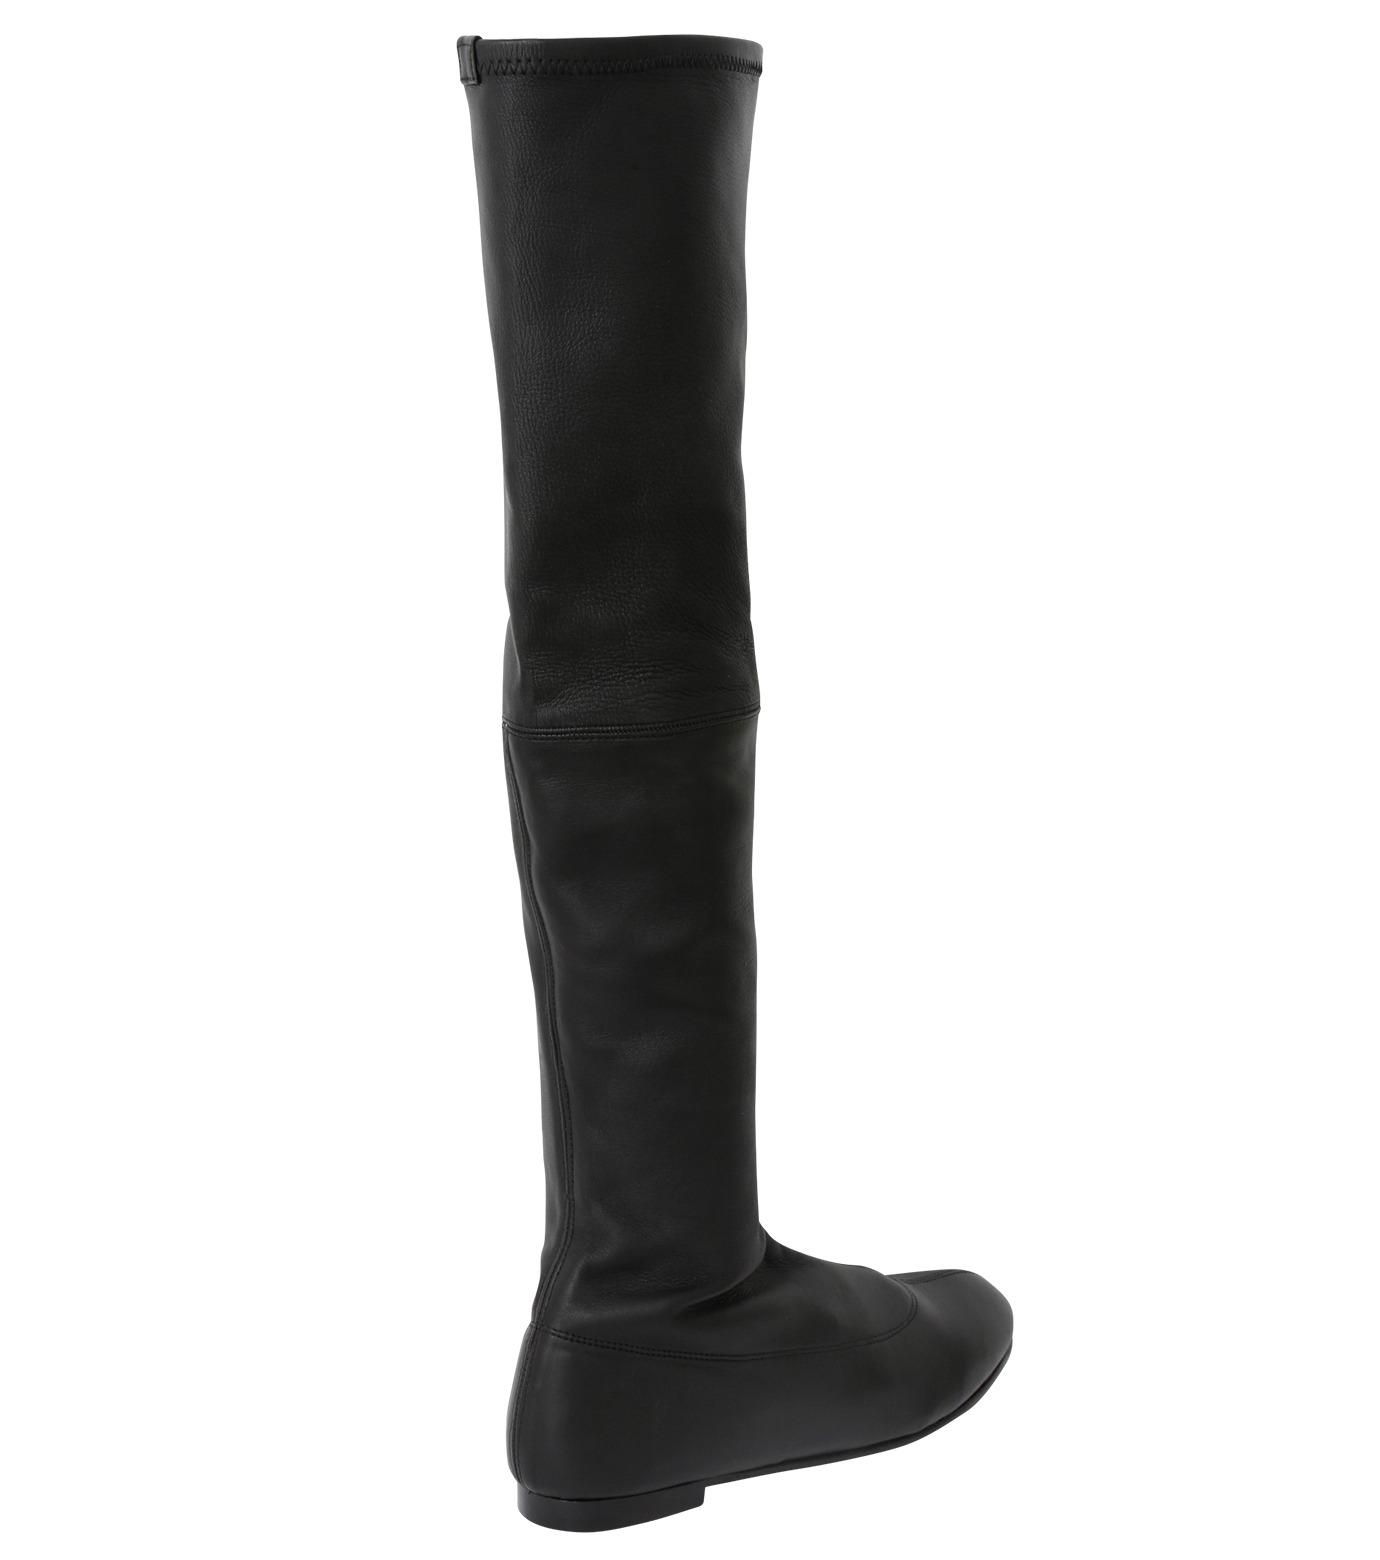 PIPPICHIC(ピッピシック)のStrech Knee High Boots-BLACK(ブーツ/boots)-PP15-STR-N14-13 拡大詳細画像2